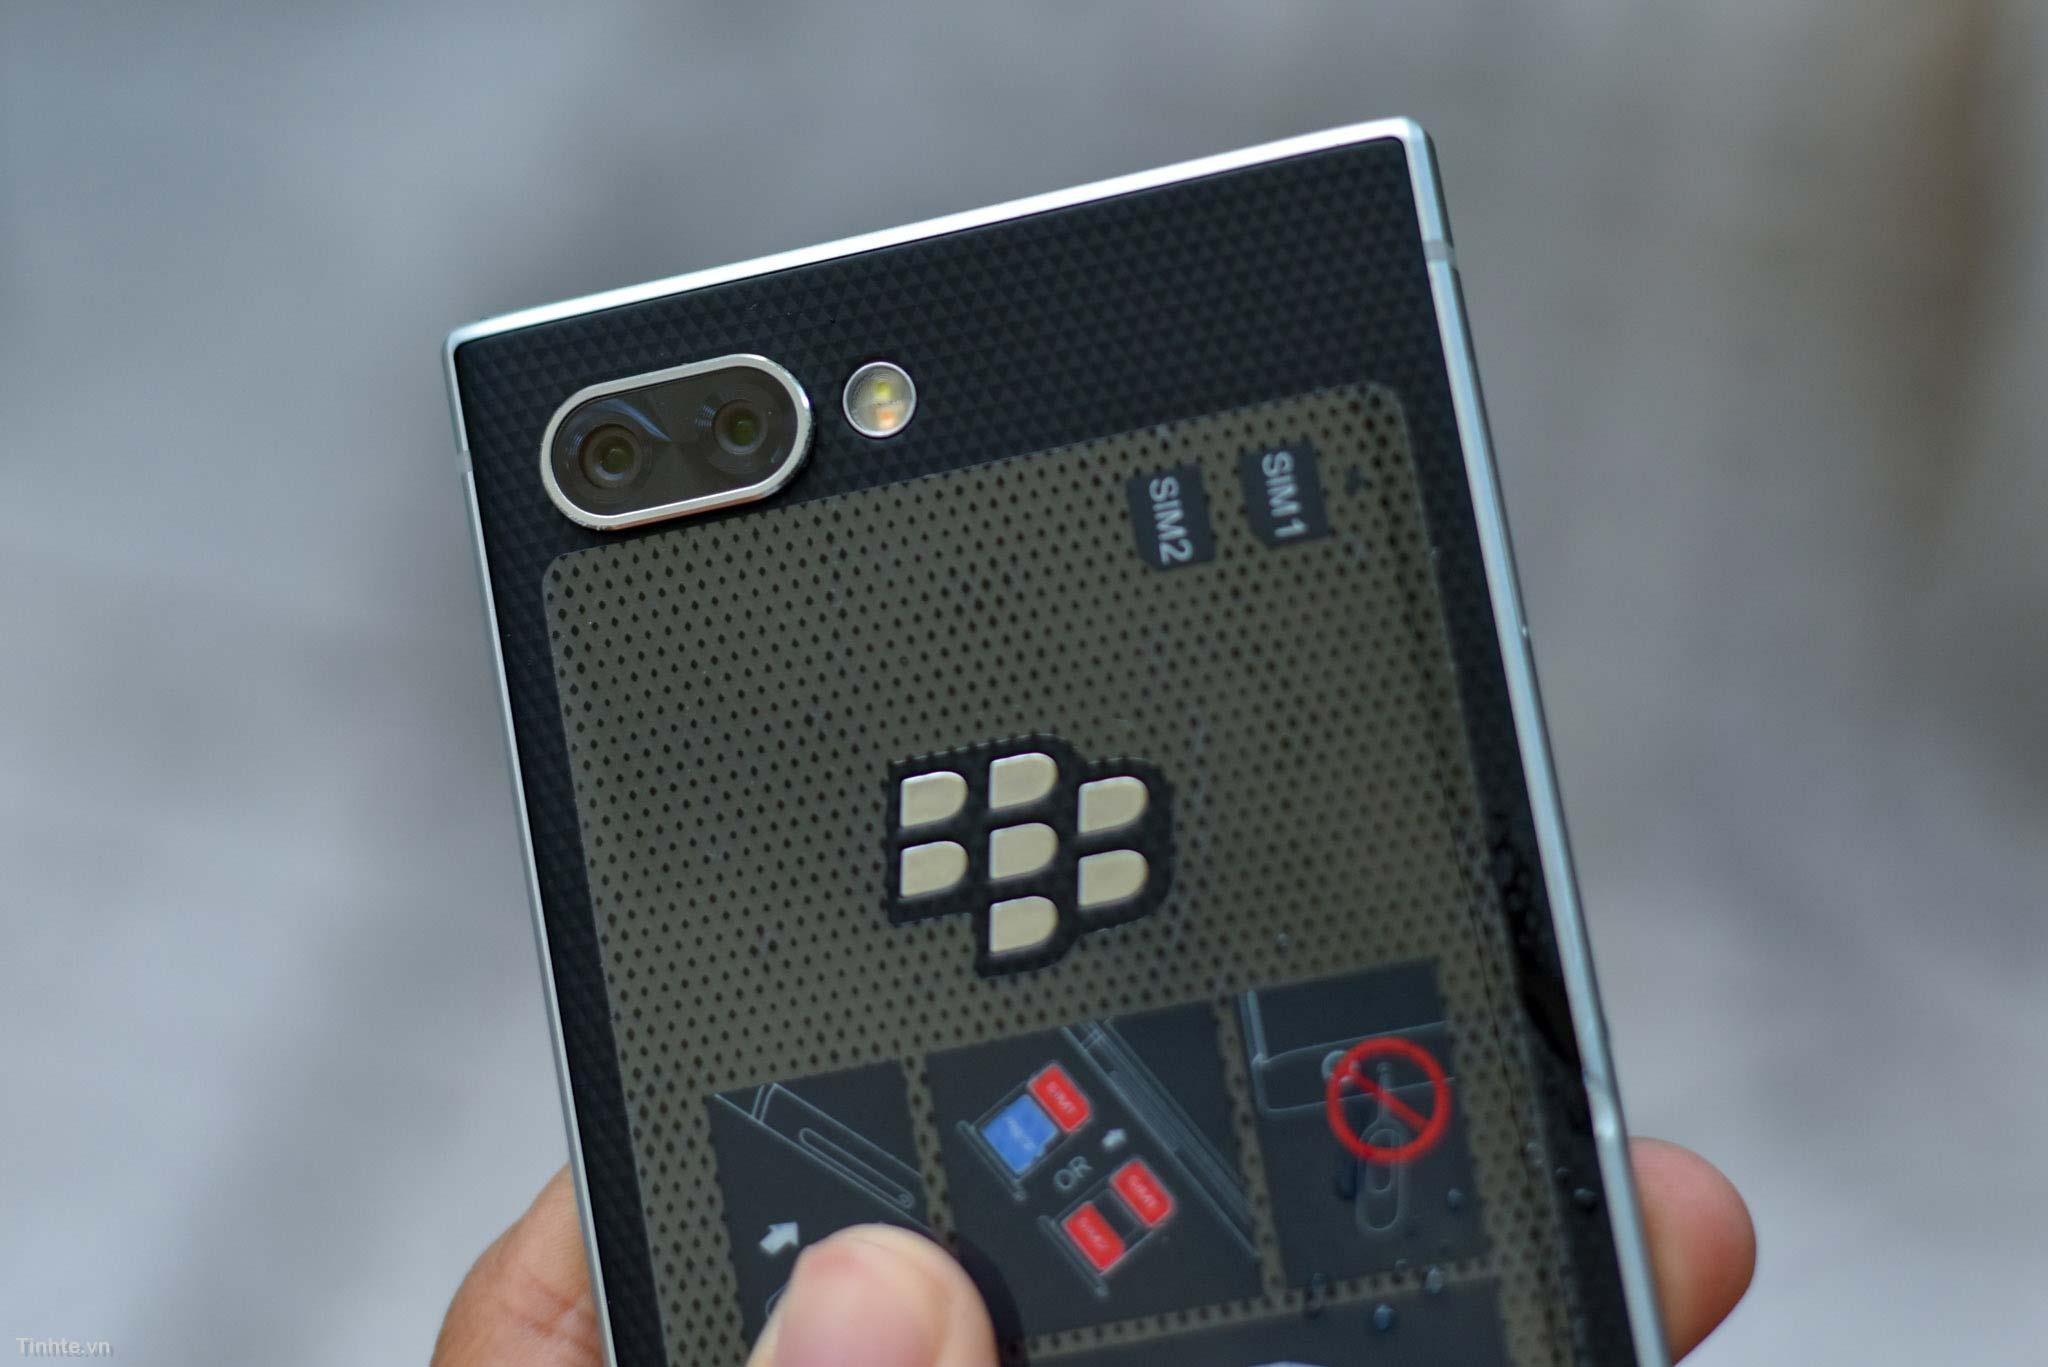 BlackBerry_KEY2_mo-hop_tinhte_8.jpg